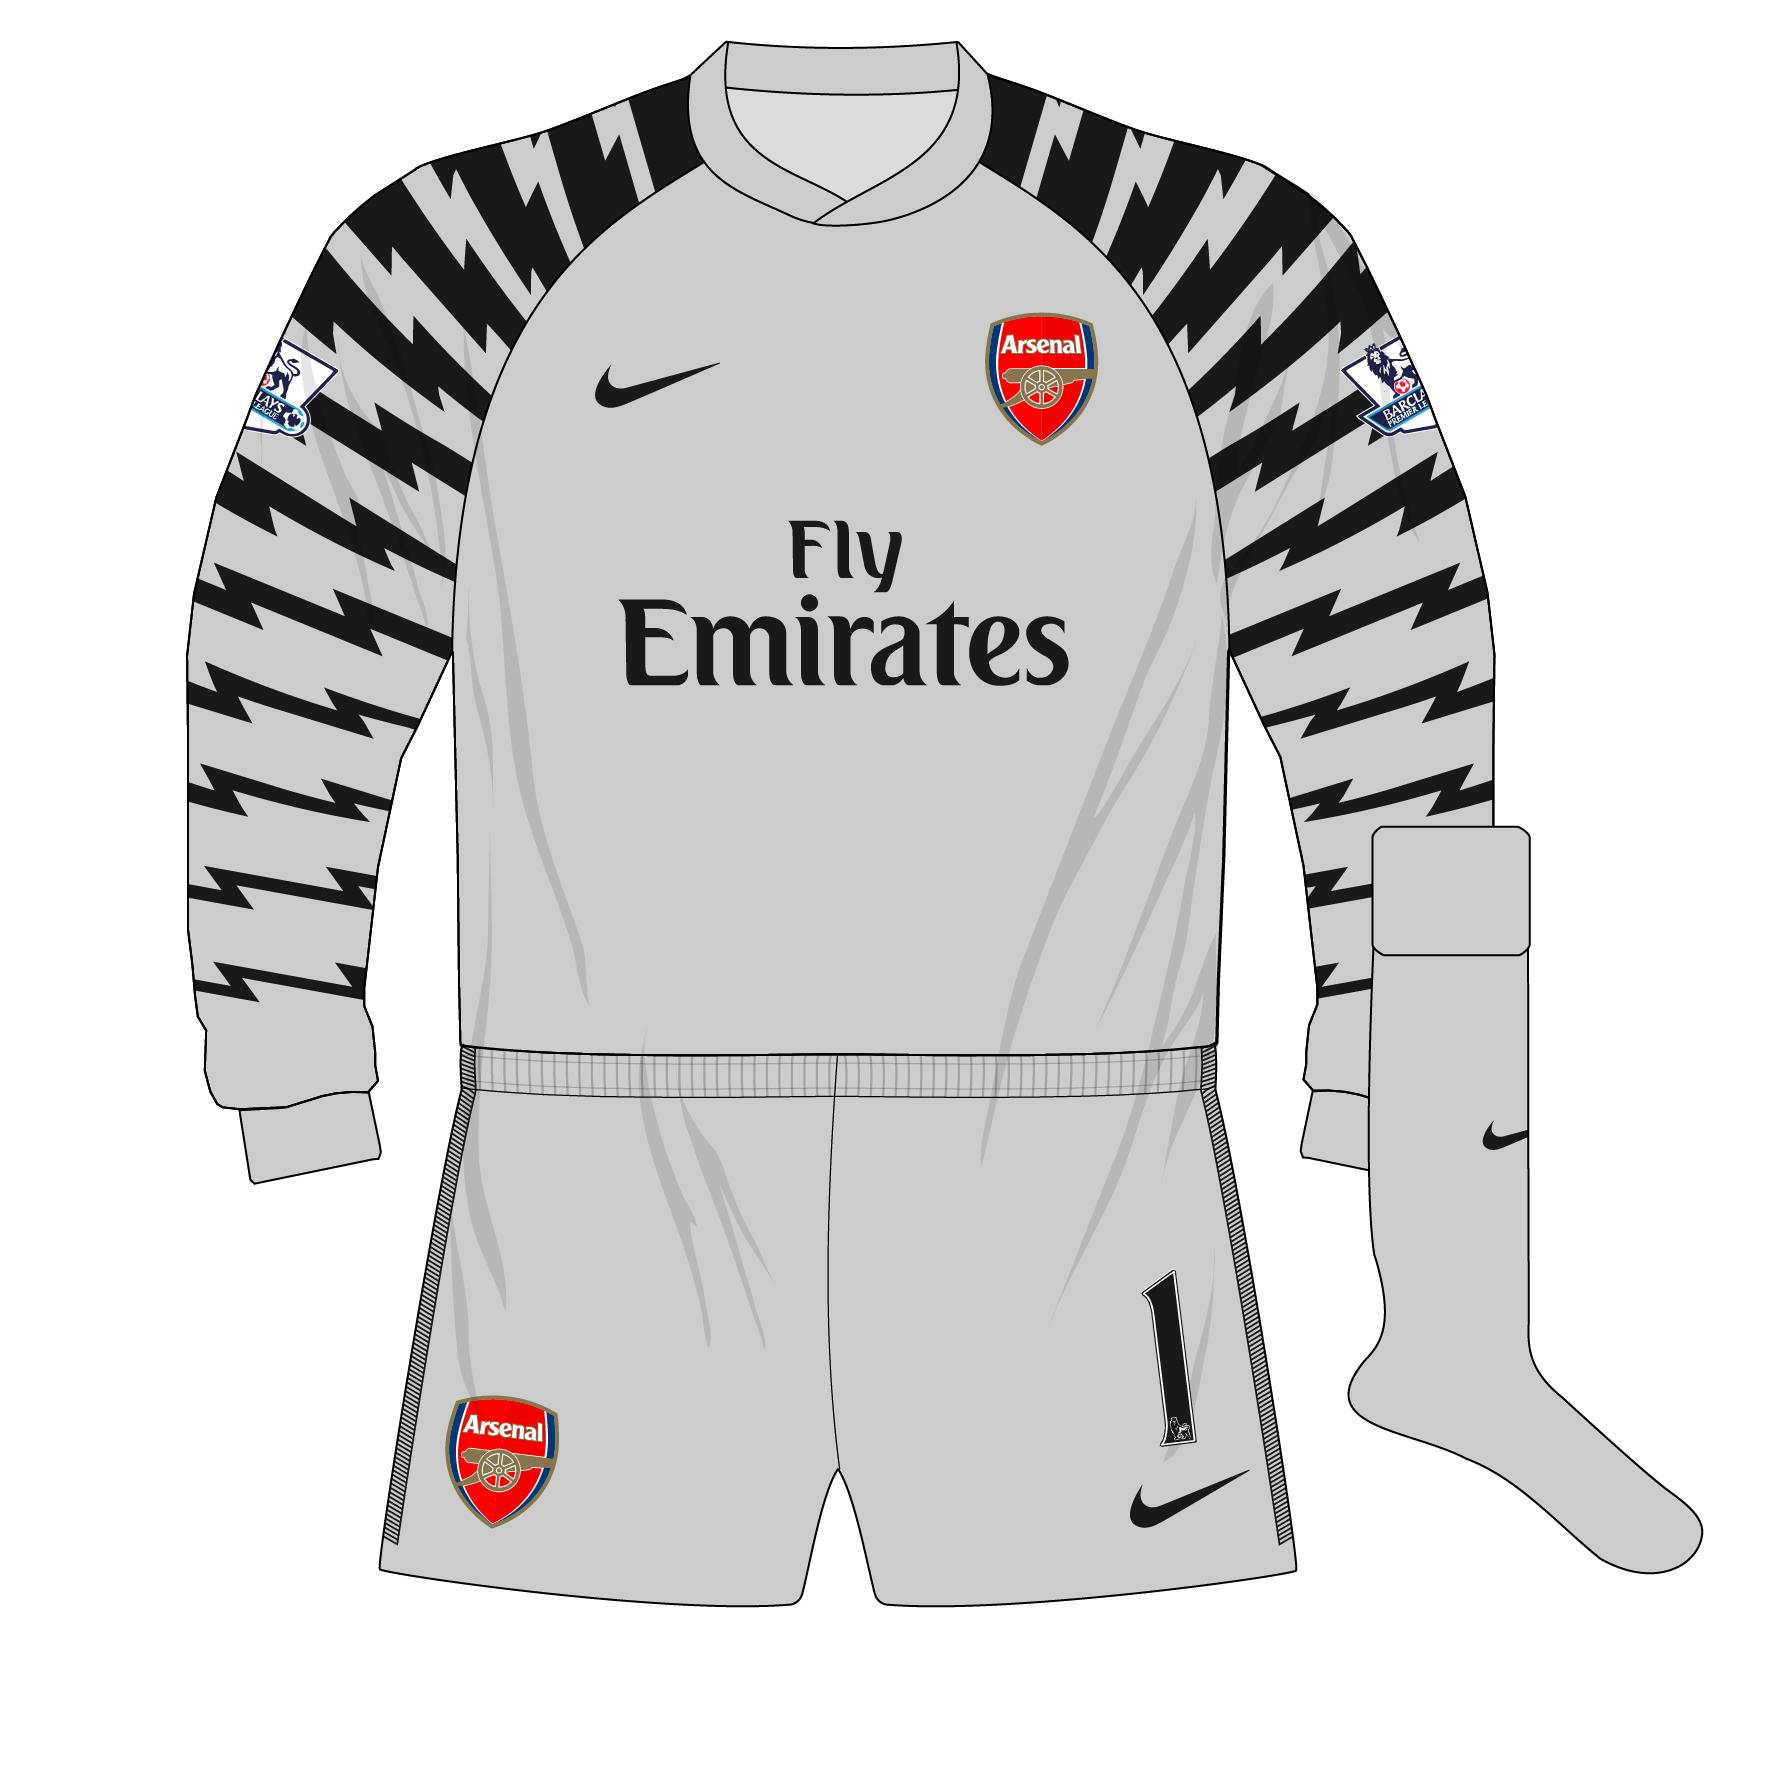 ae9b7748496 Arsenal-Nike-2010-2011-Grey-goalkeeper-shirt-kit-Almunia-01 – Museum ...